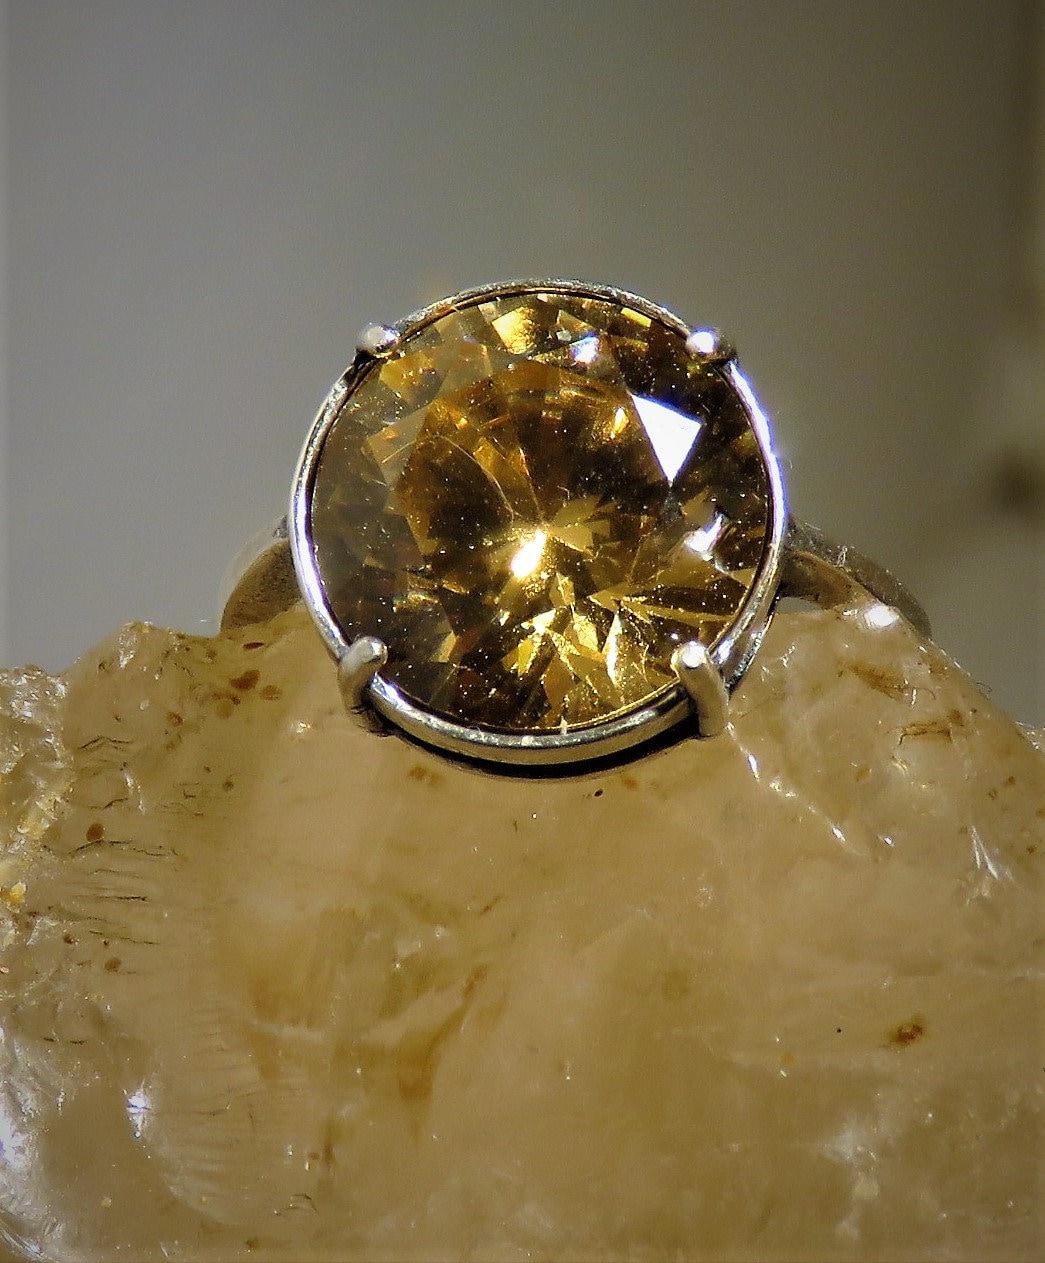 Golden Zircon Ring Adjustable Natural Gem Not Cz From Cambodia Yellow Near Flawless 12mm Round Brilliant Cut W Stunning Scintillation